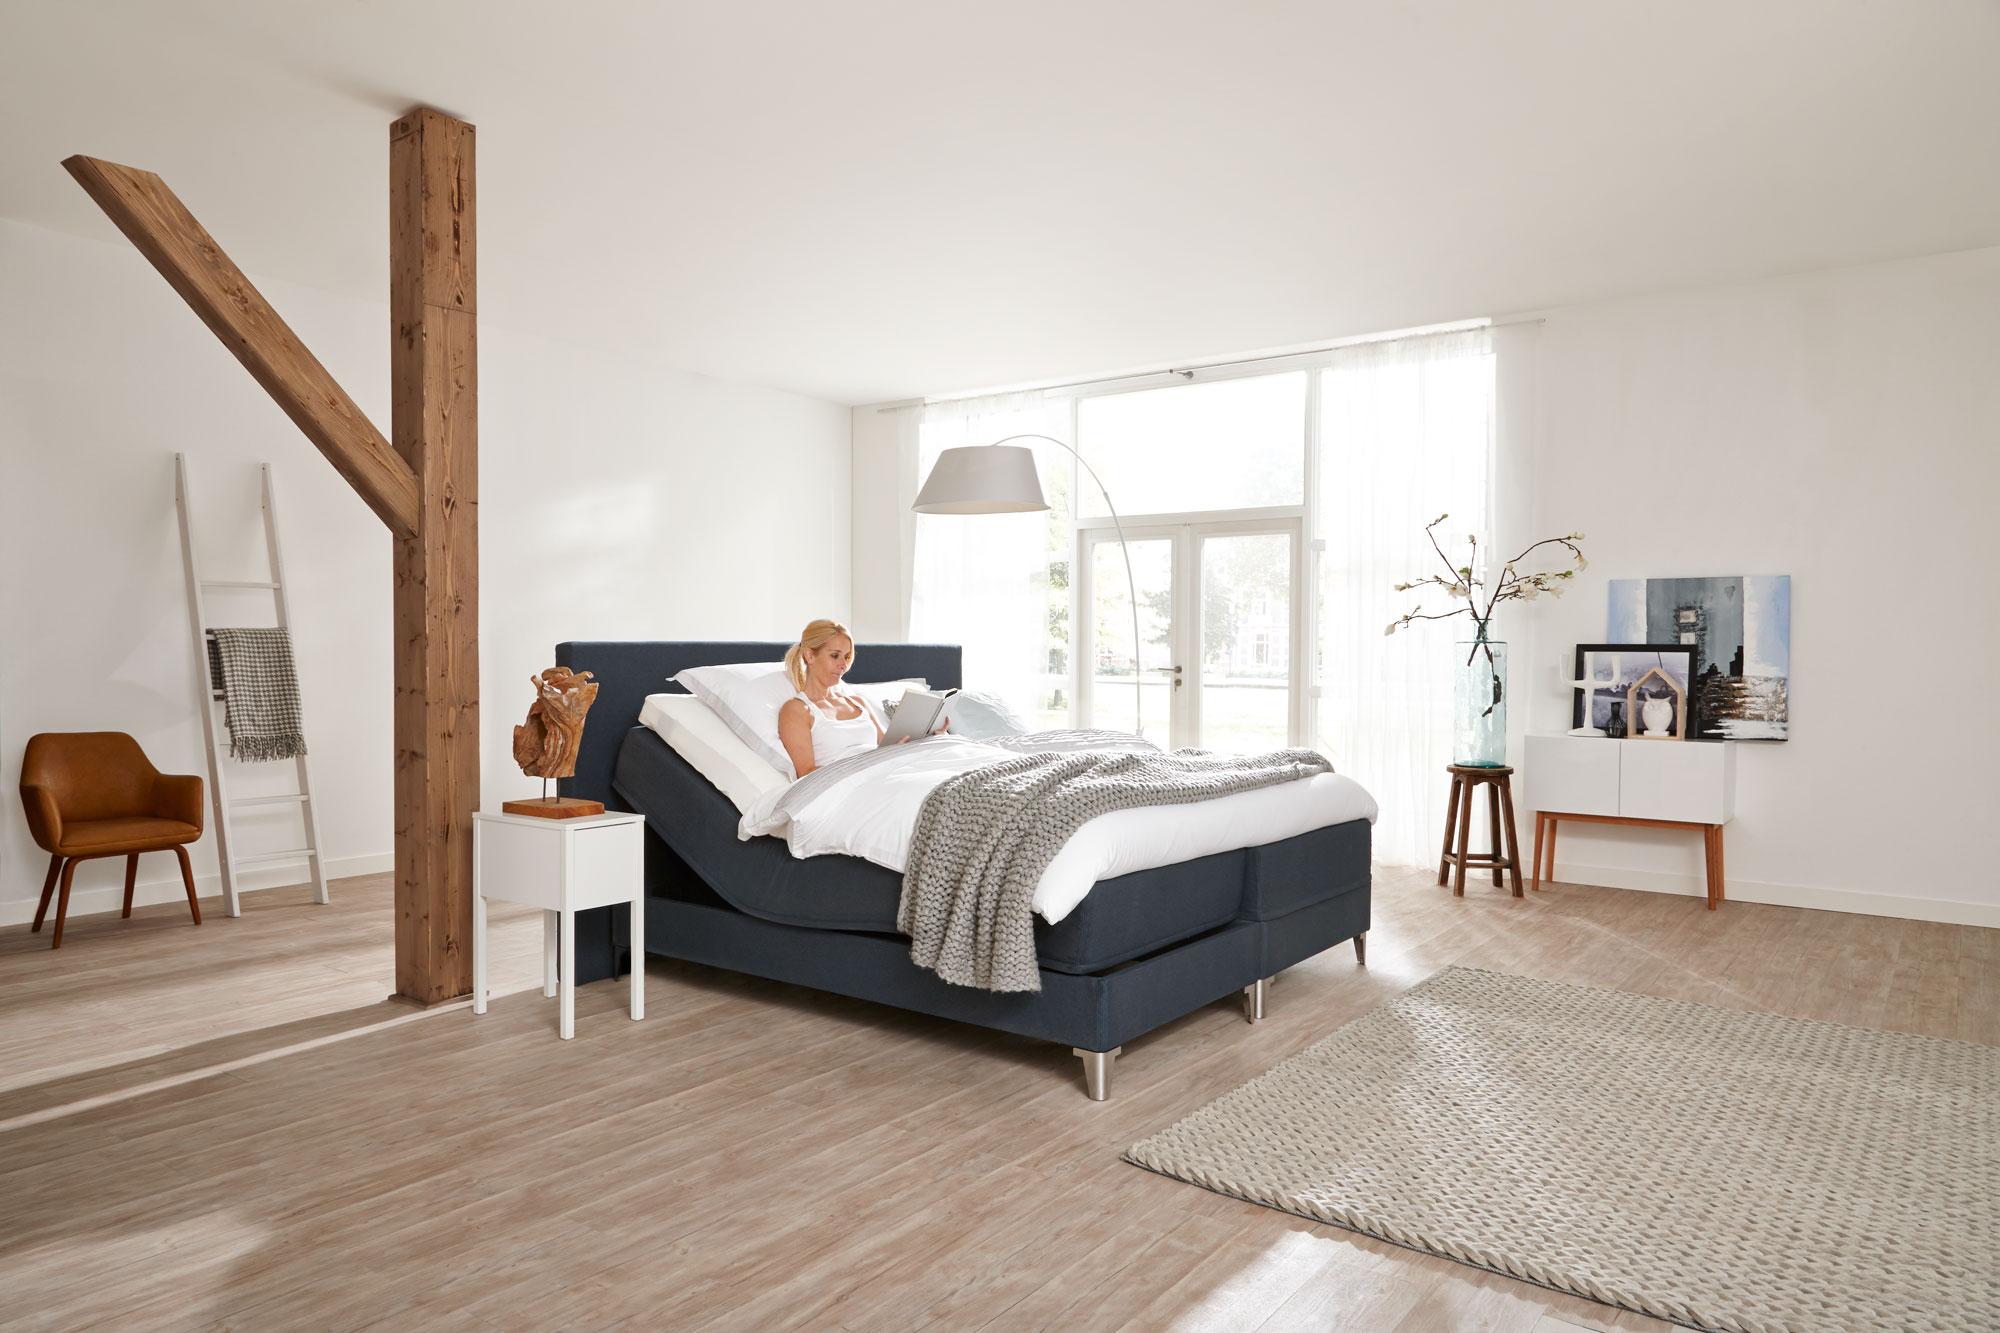 Swiss Sense Matras : Matras kopen eigentijdse matras kopen swiss sense